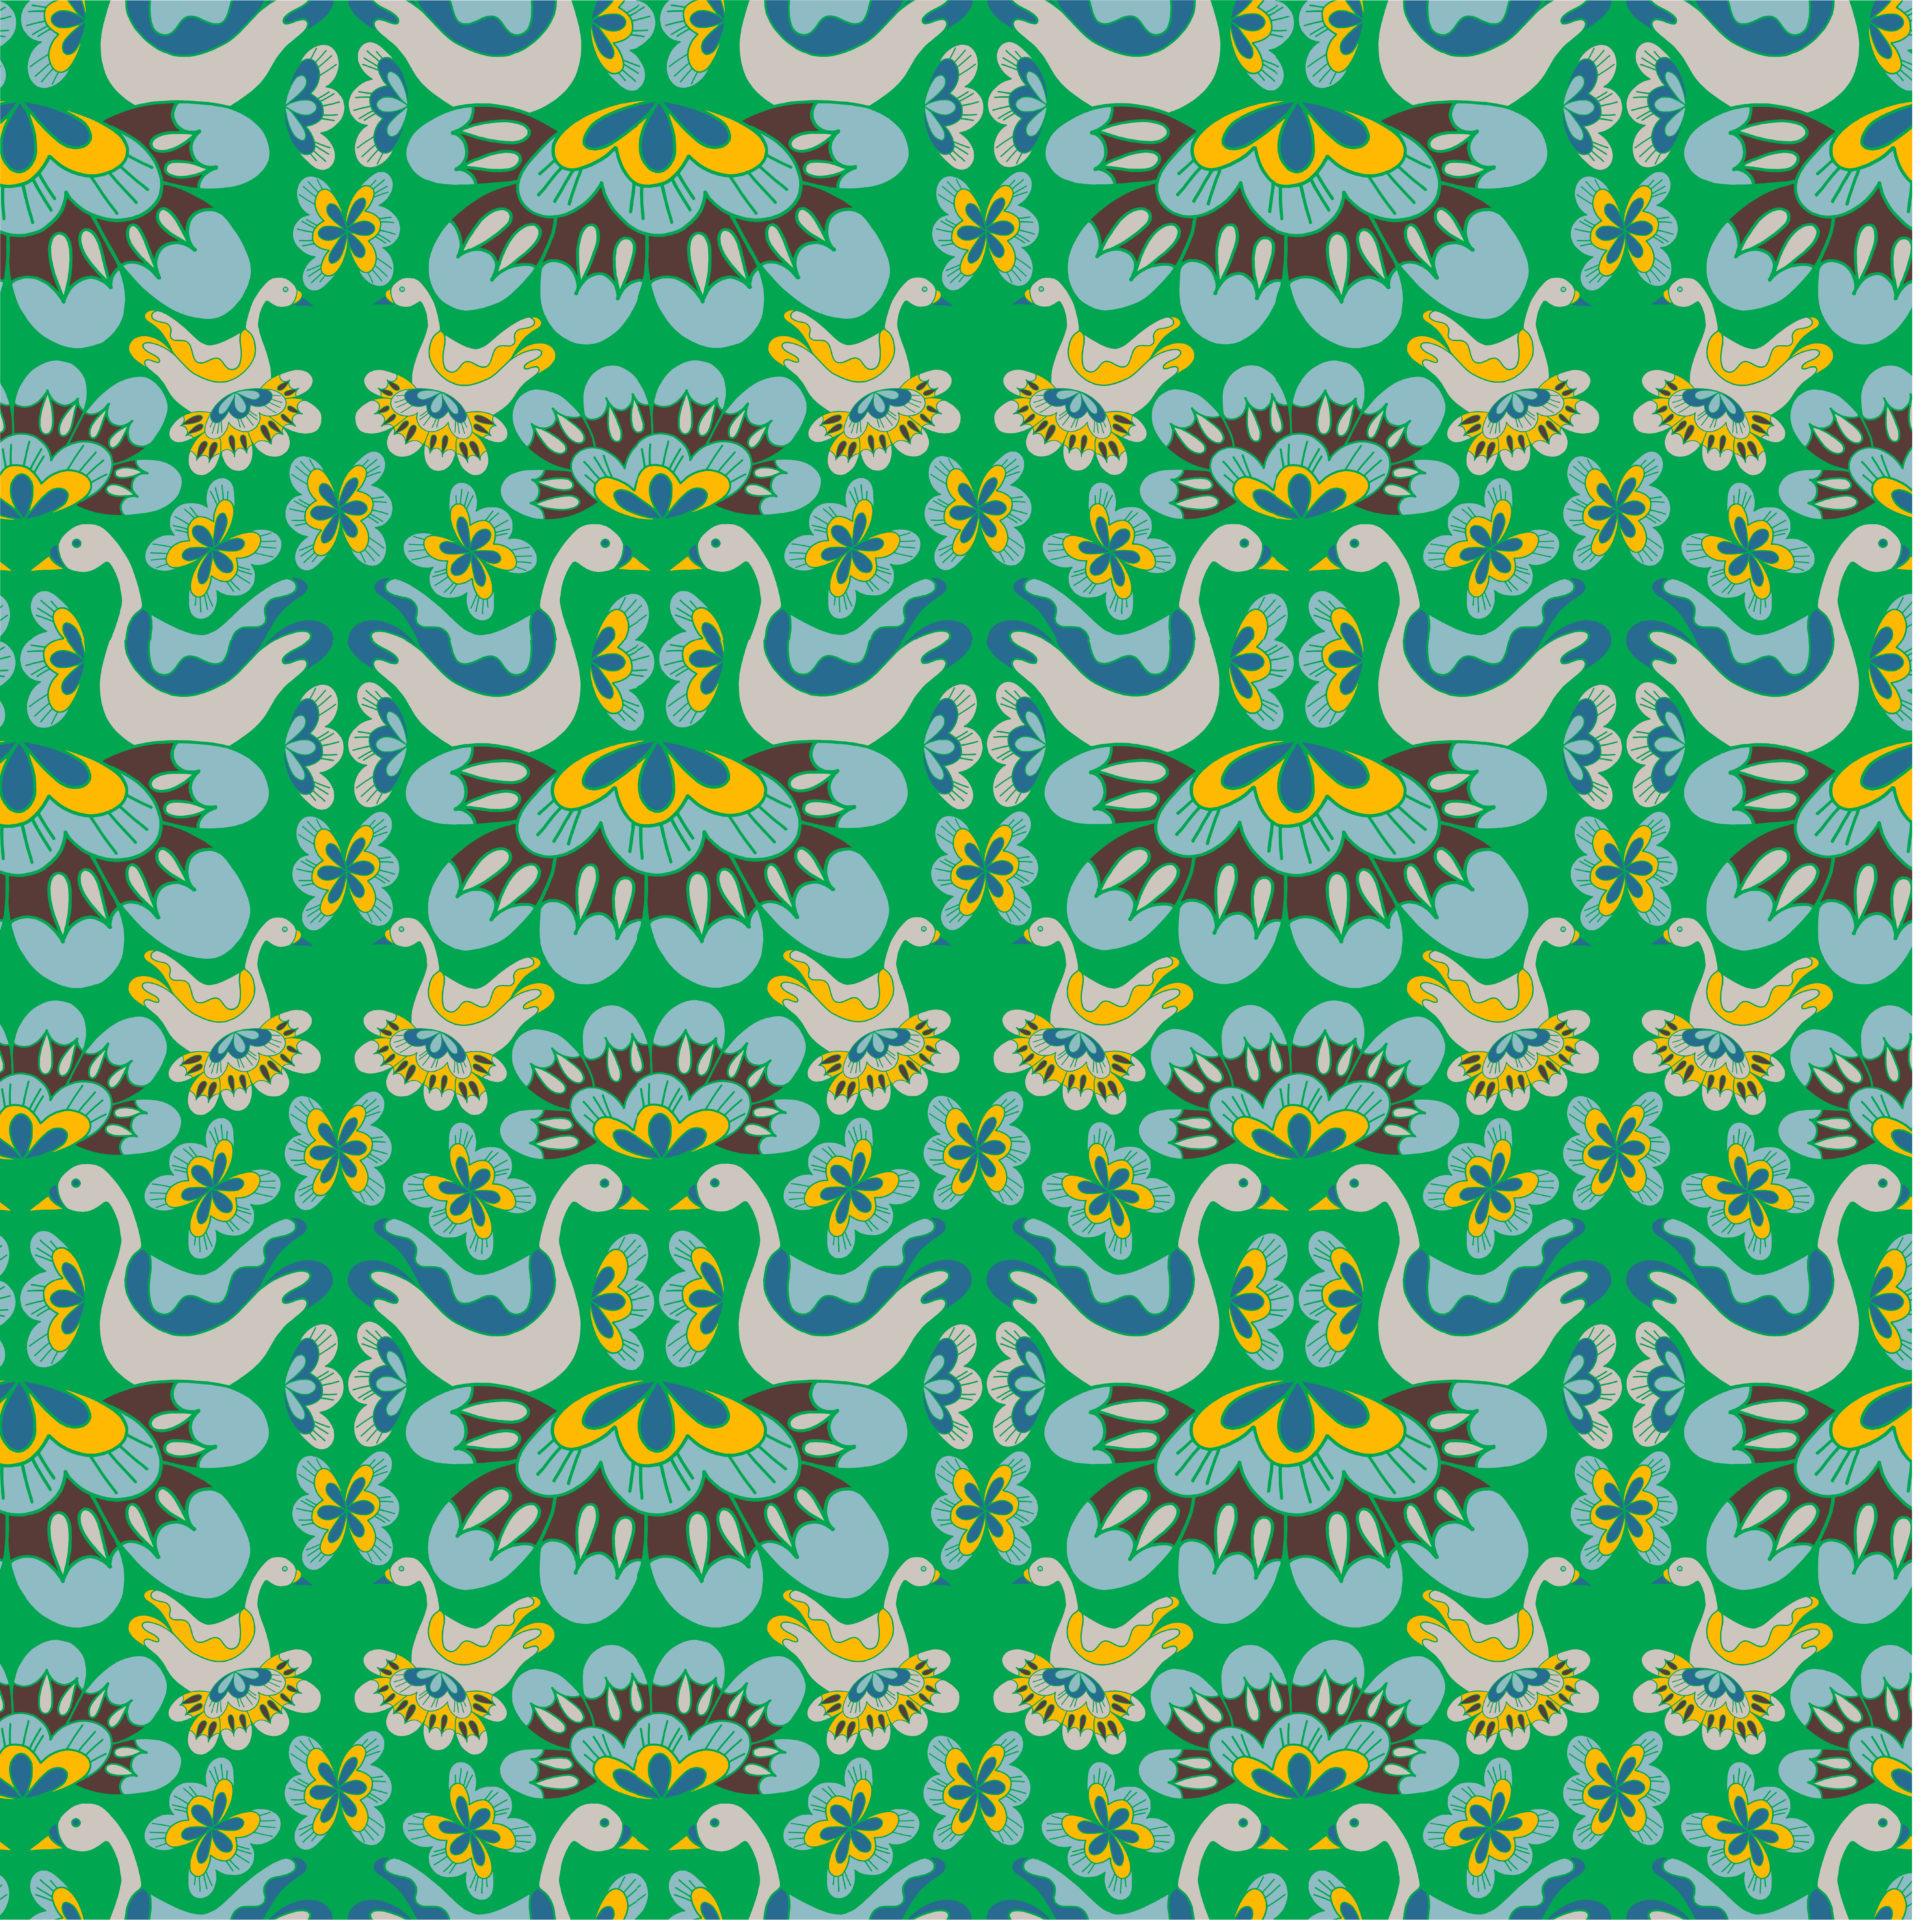 Green Swan design